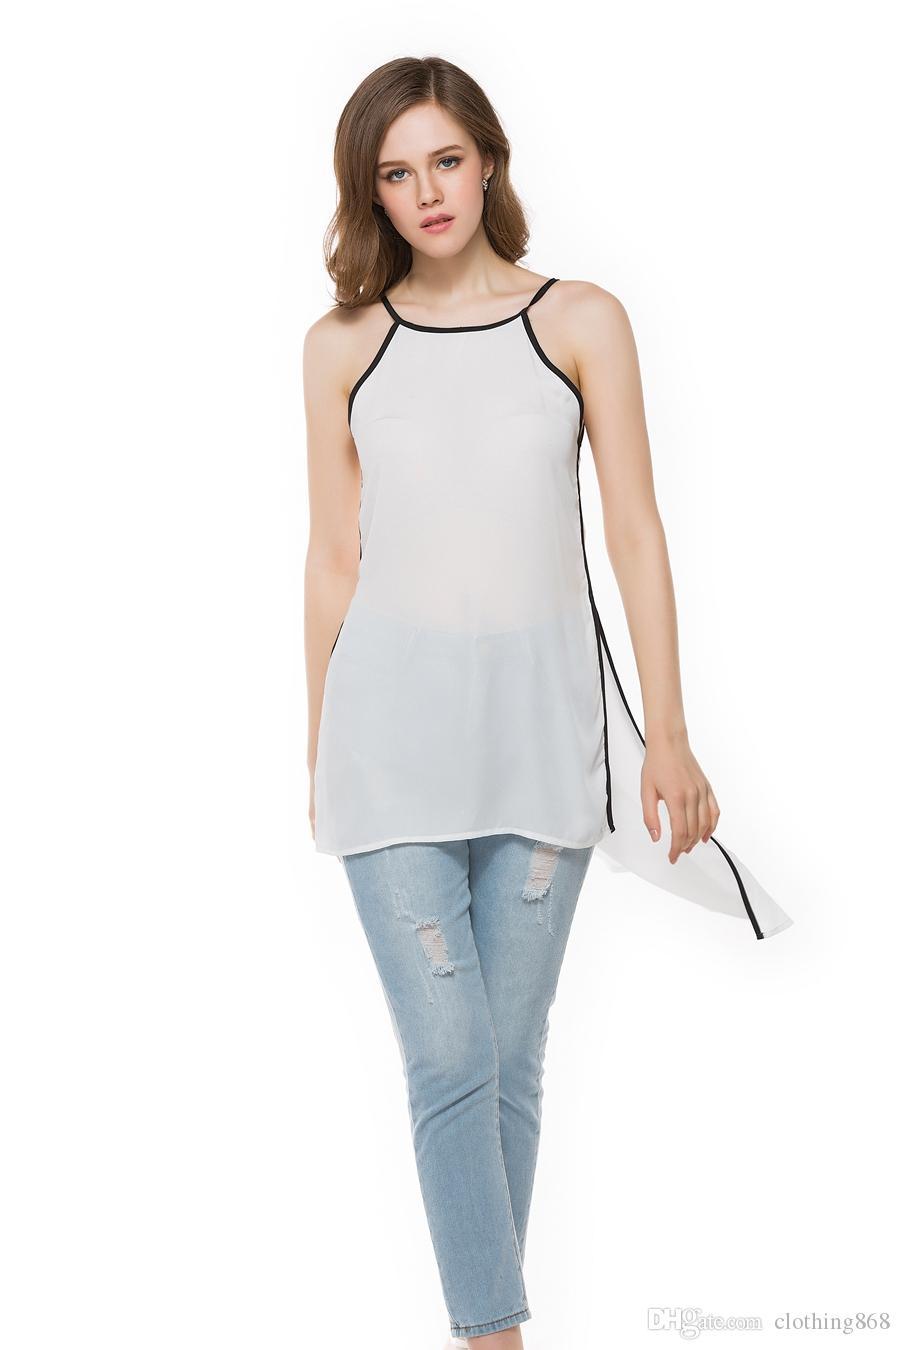 Shirt design female - Hot Selling Women Clothing T Shirt Personality Lacing Design Fashion Sexy Girl White Sling Long